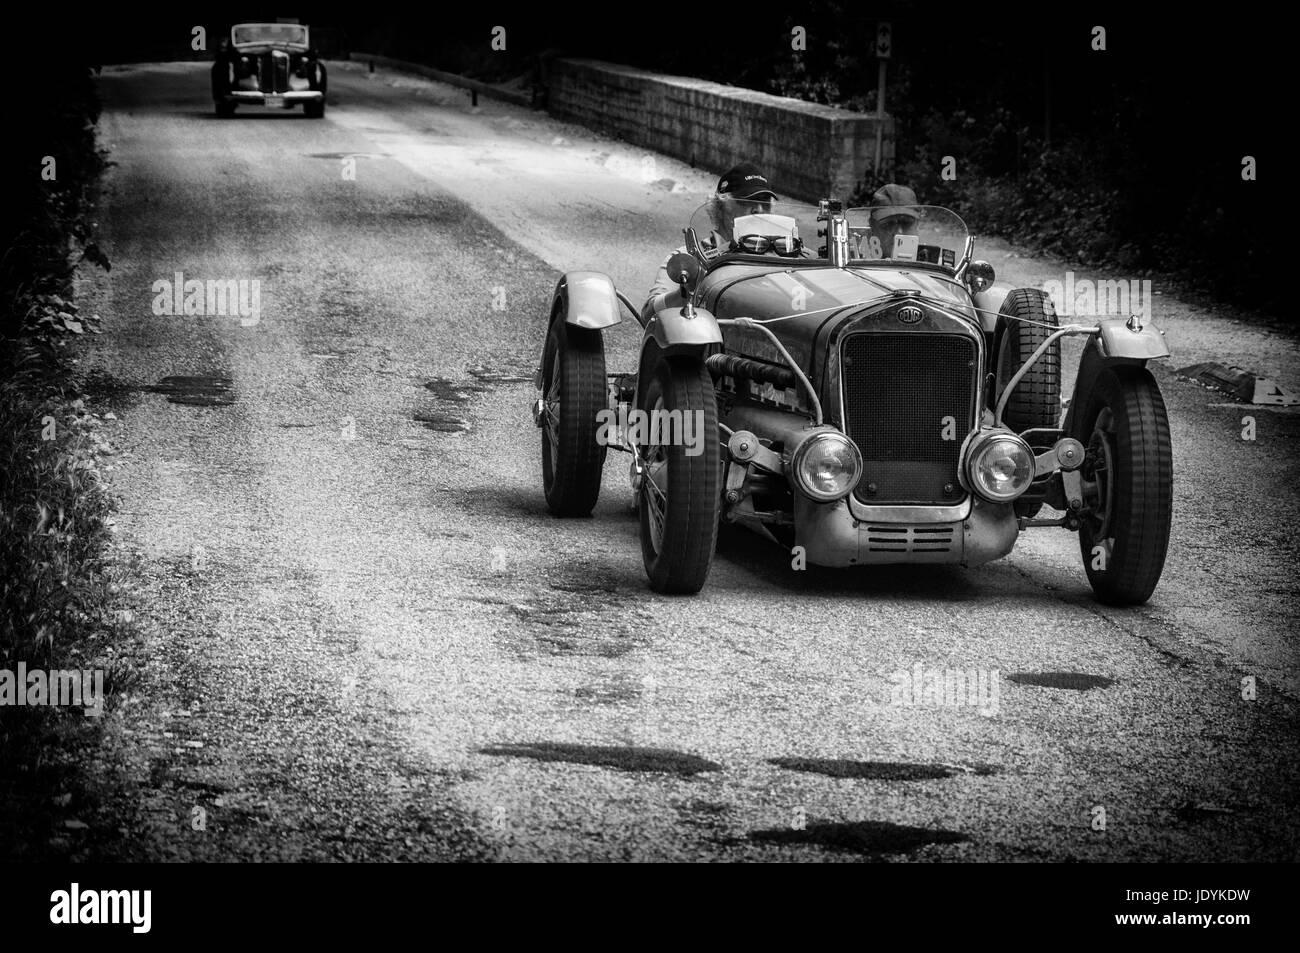 DELAGE D6 75 SPORT 1939 - Stock Image